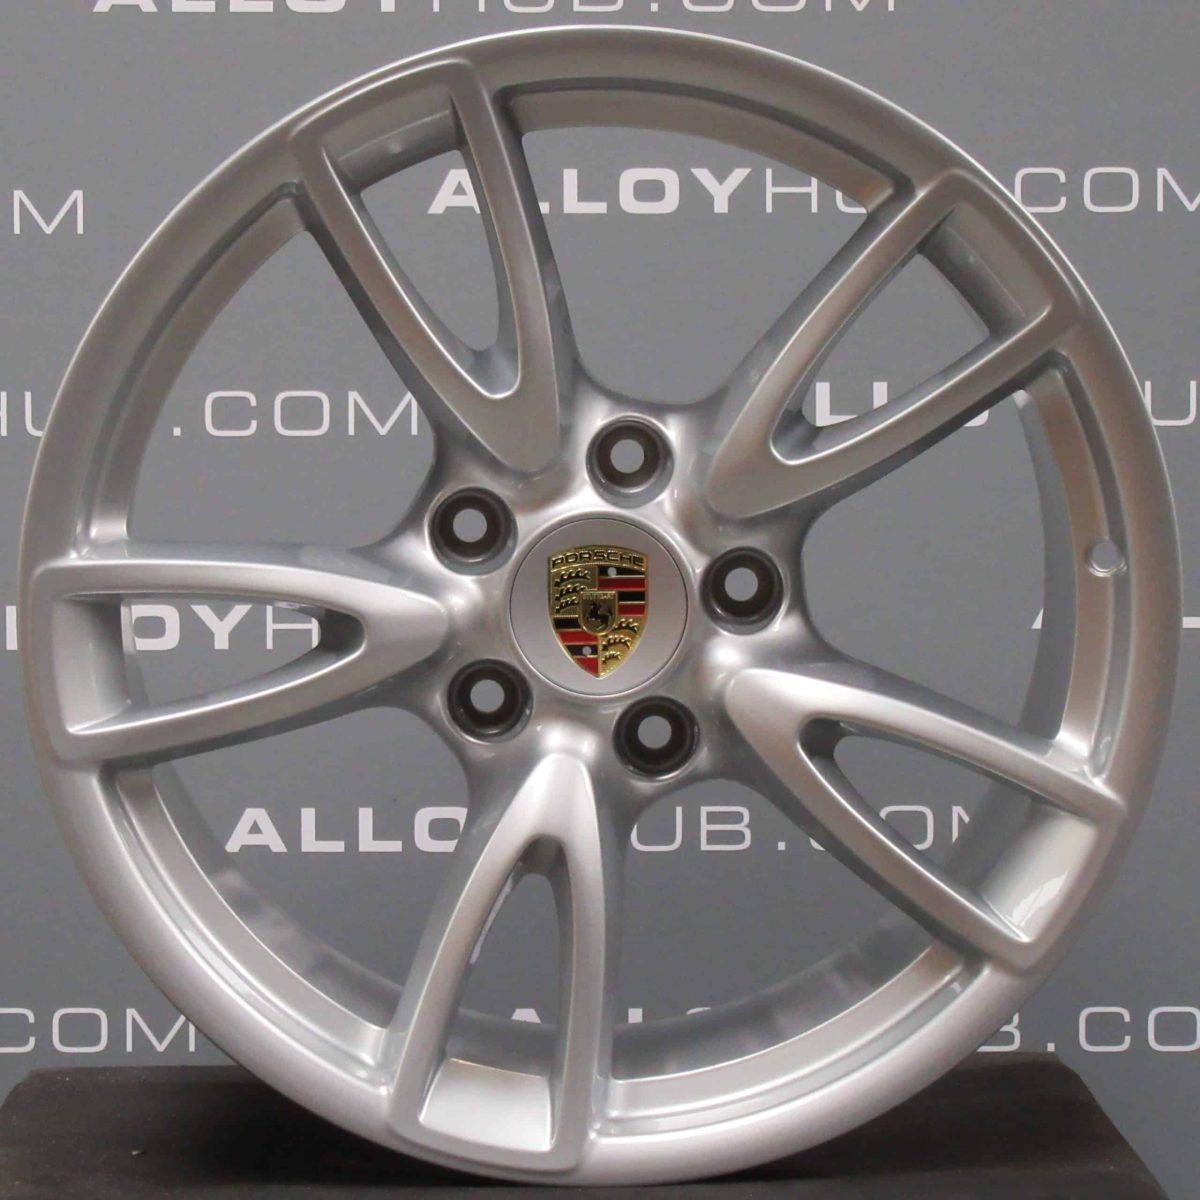 Genuine Porsche 911 997 Carrera 2/2S Gen 2 5 Twin Spoke 18″ Inch Alloy Wheels with Silver Finish 99736213701 99736214105